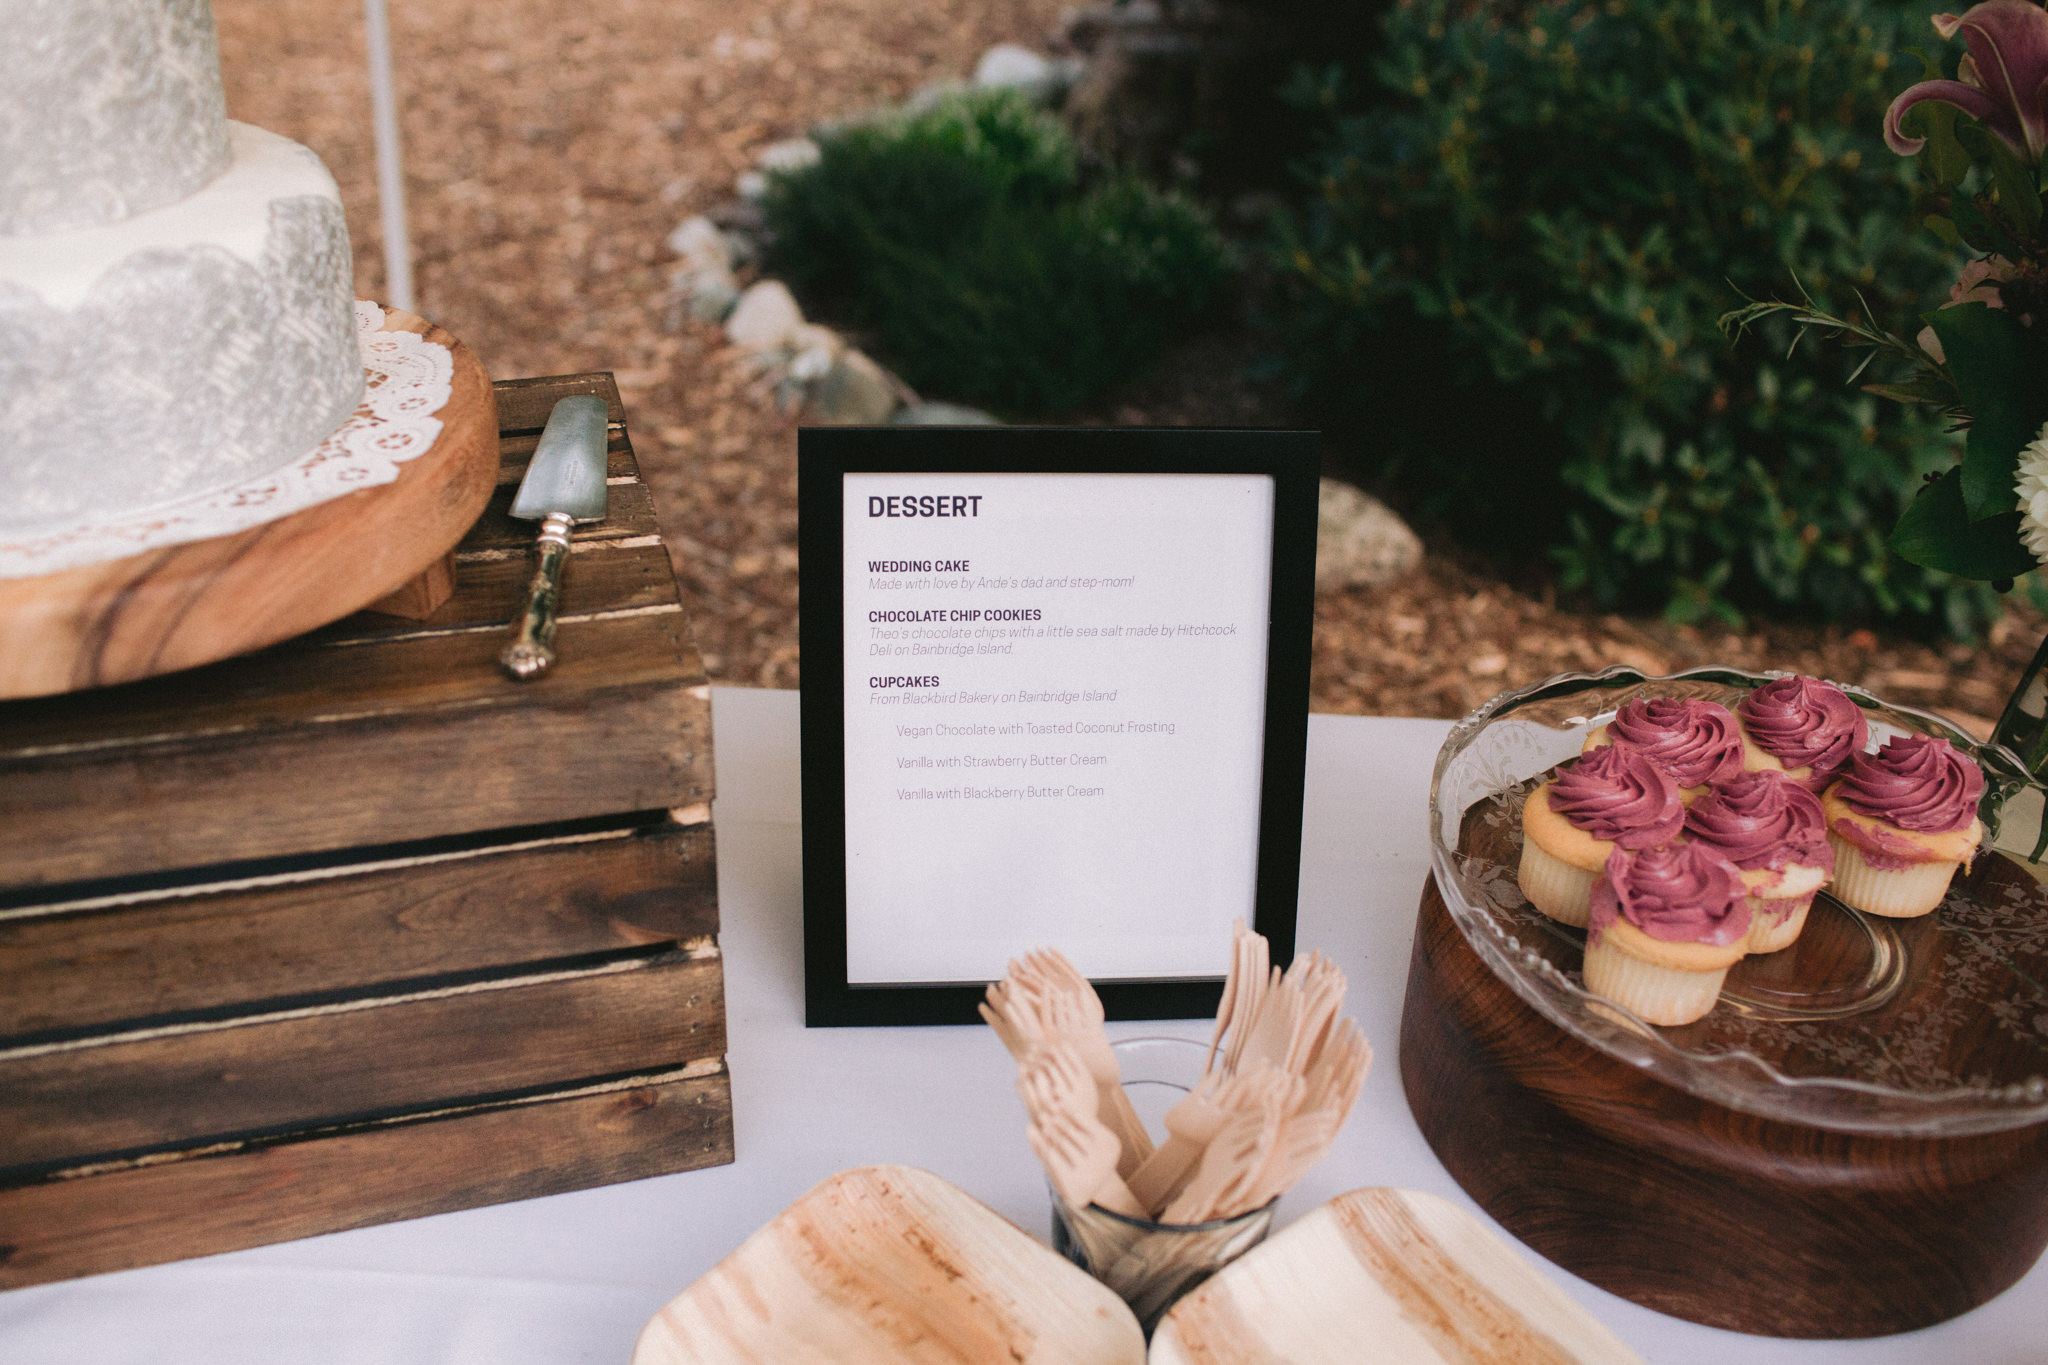 Backyard-Bainbridge-Island-Wedding-Alycia-Lovell-Photography-181.JPG